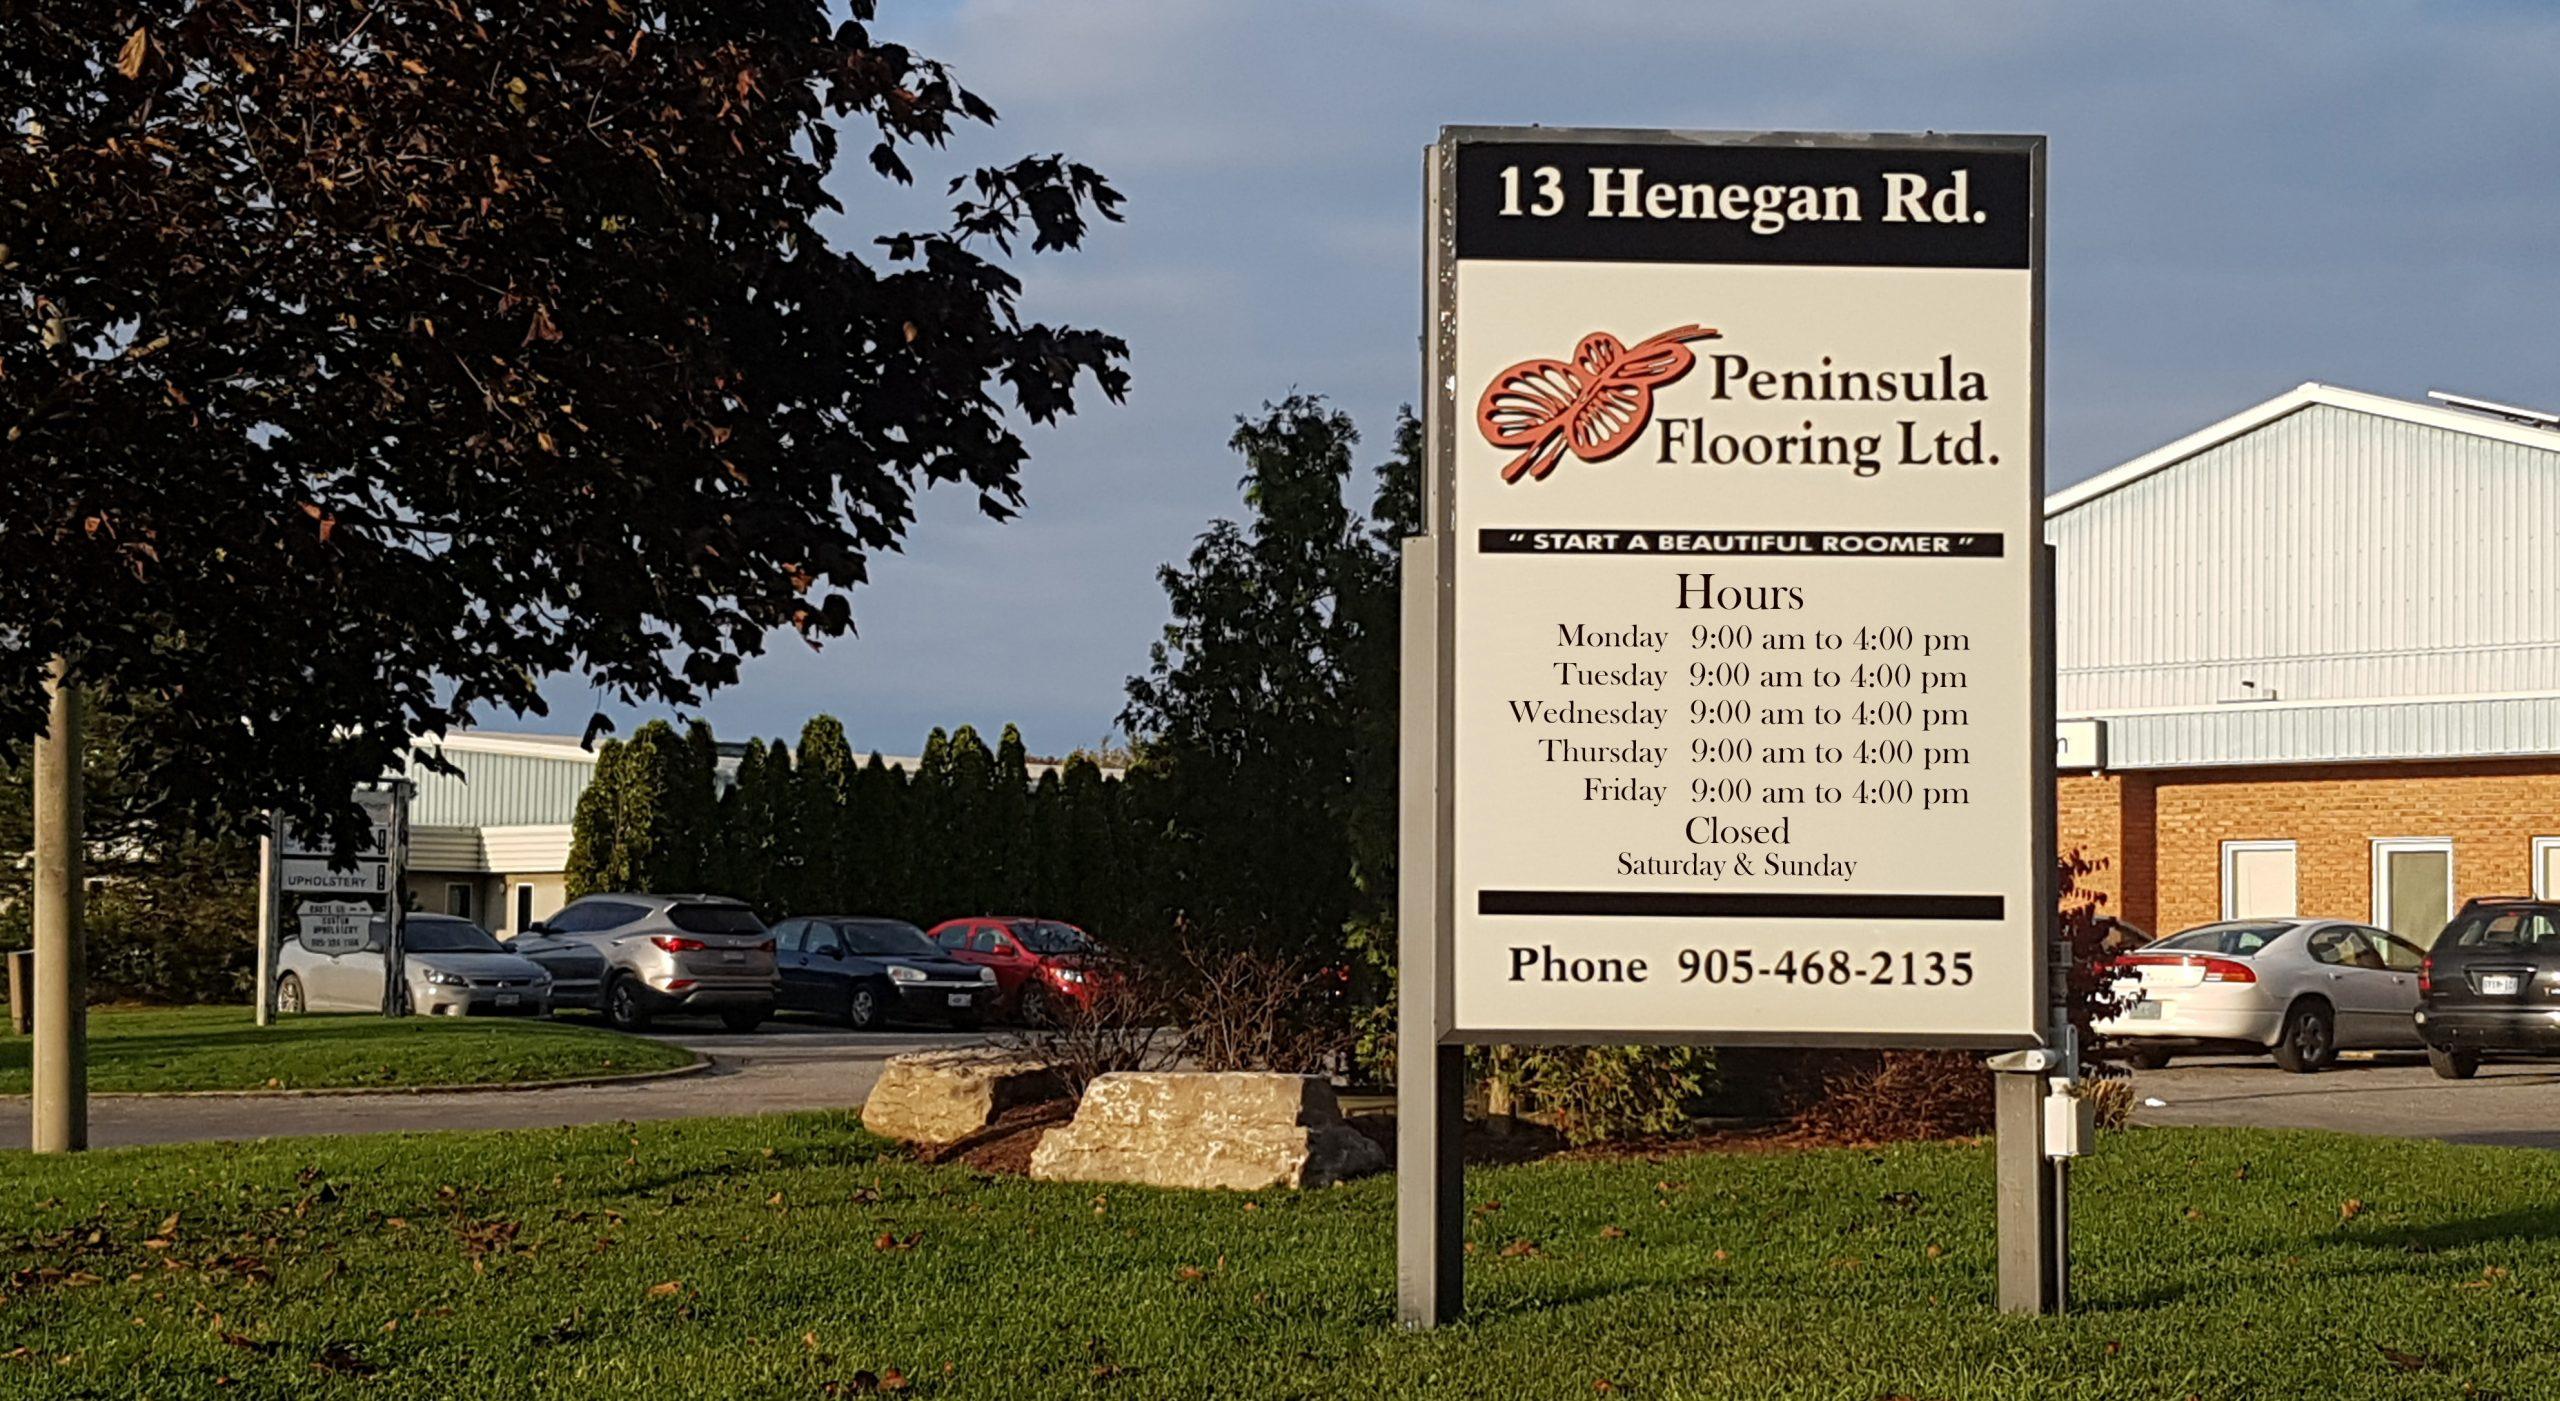 Peninsula Flooring Hours - Hours July 13 2021 - 9-4